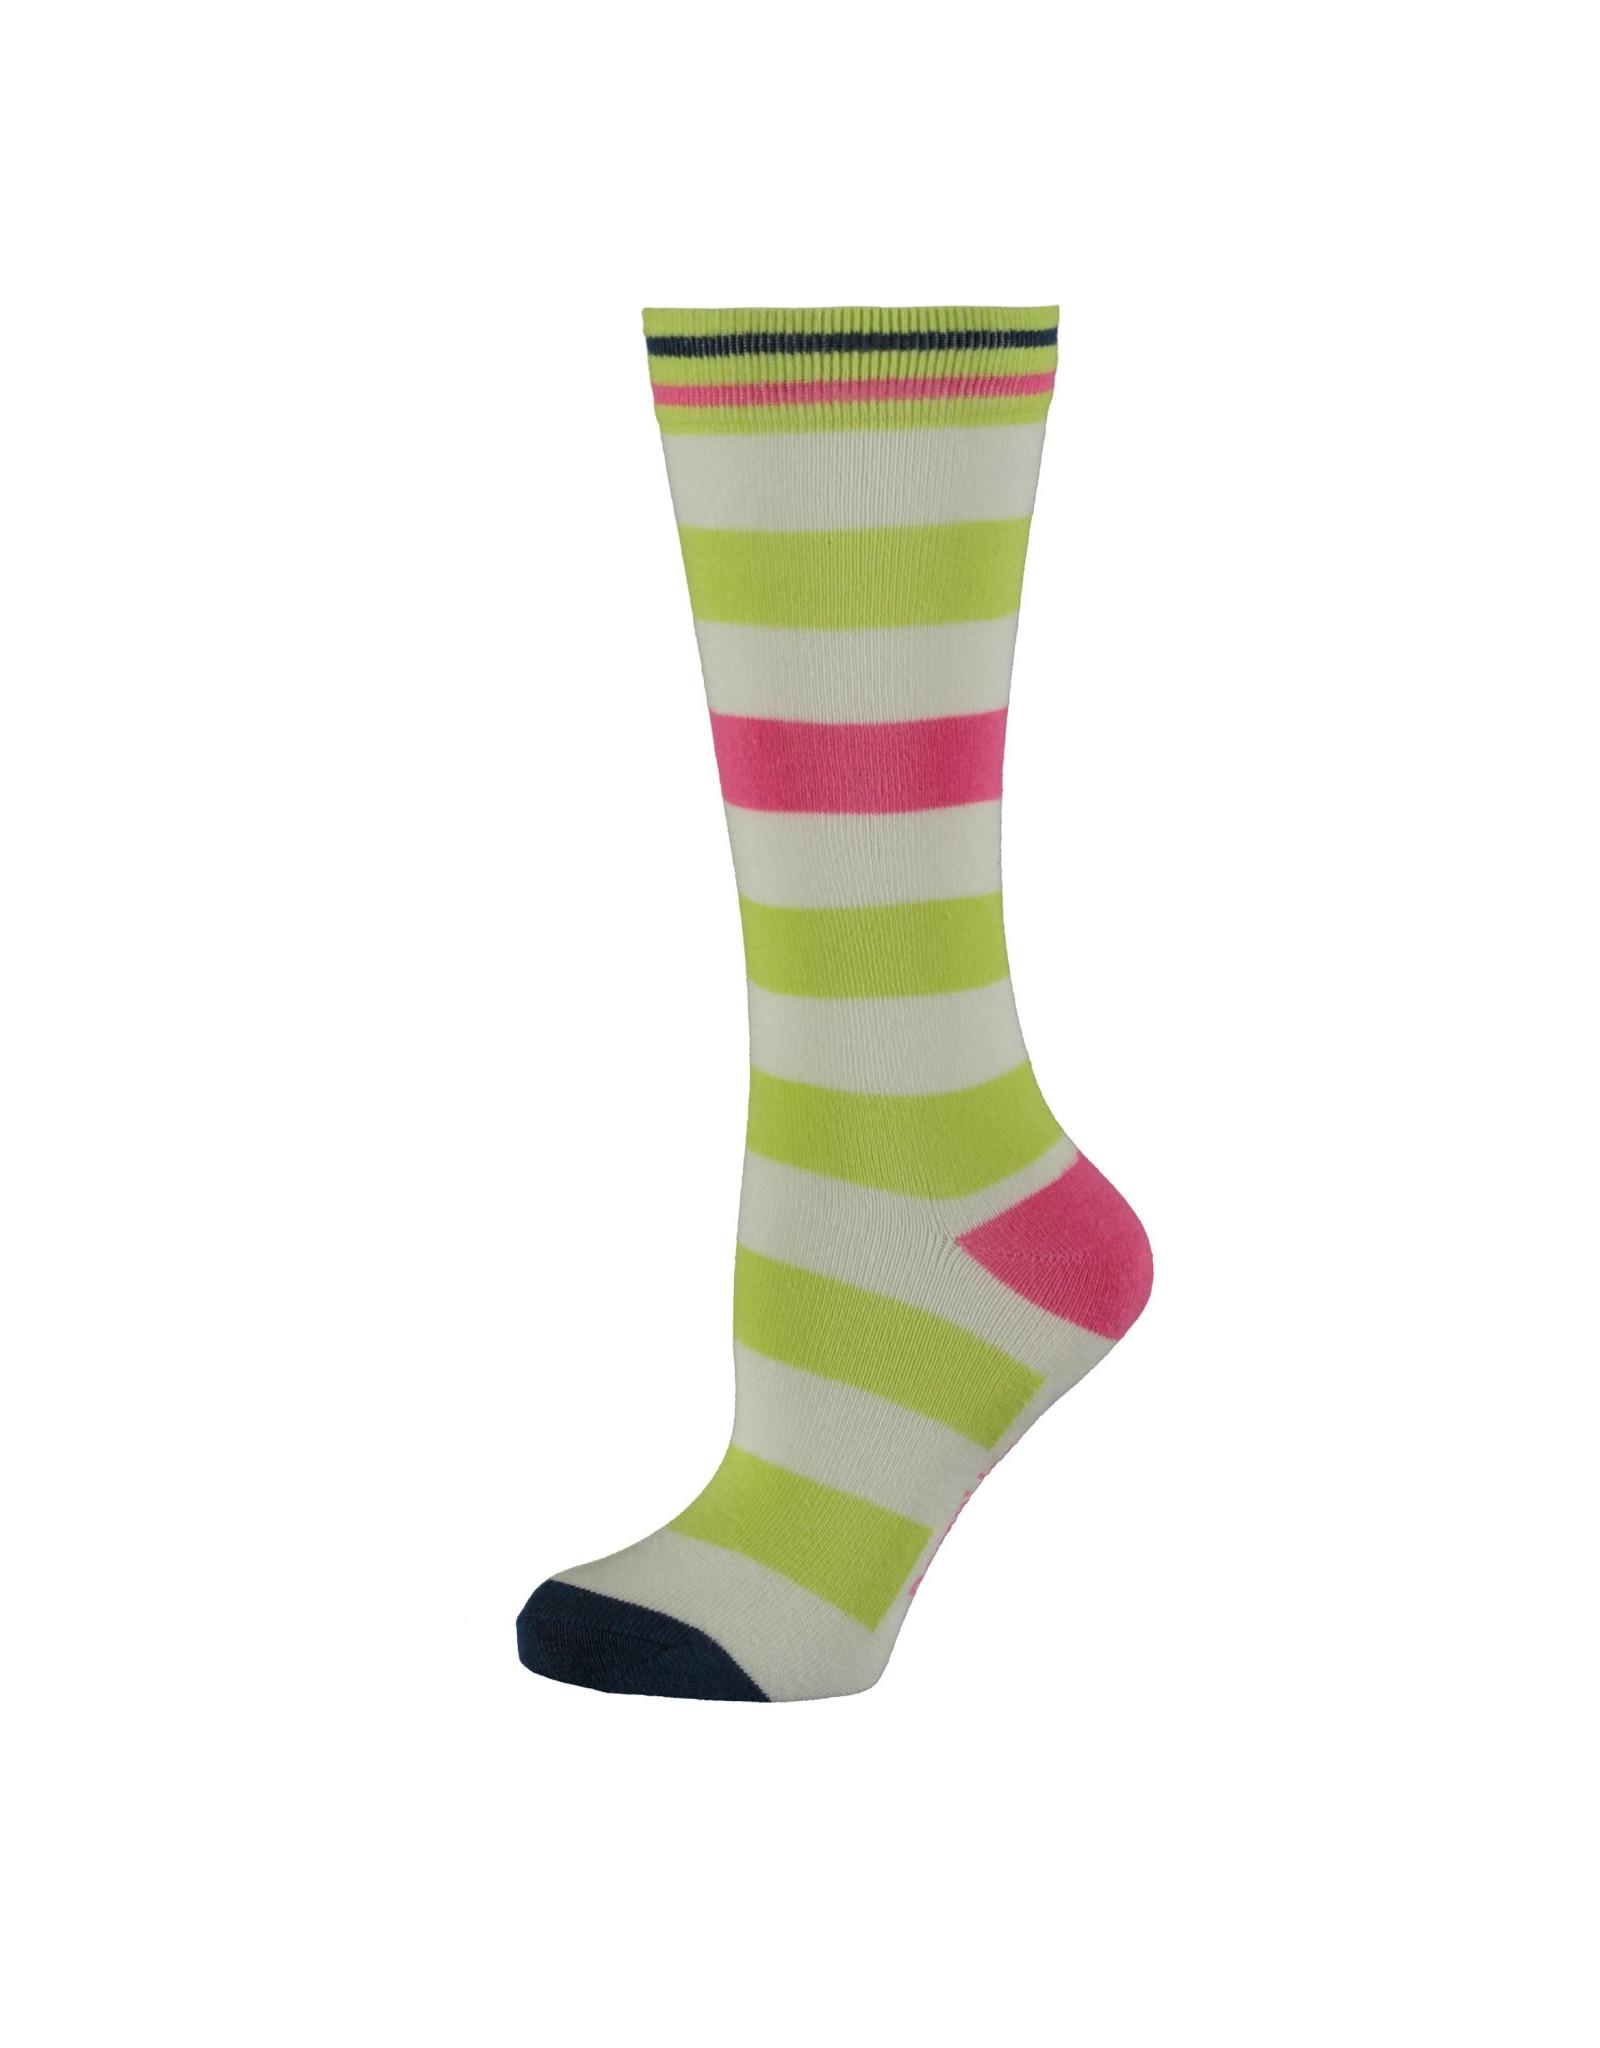 Bampidano Bampidano meisjes sokken Elli Lime